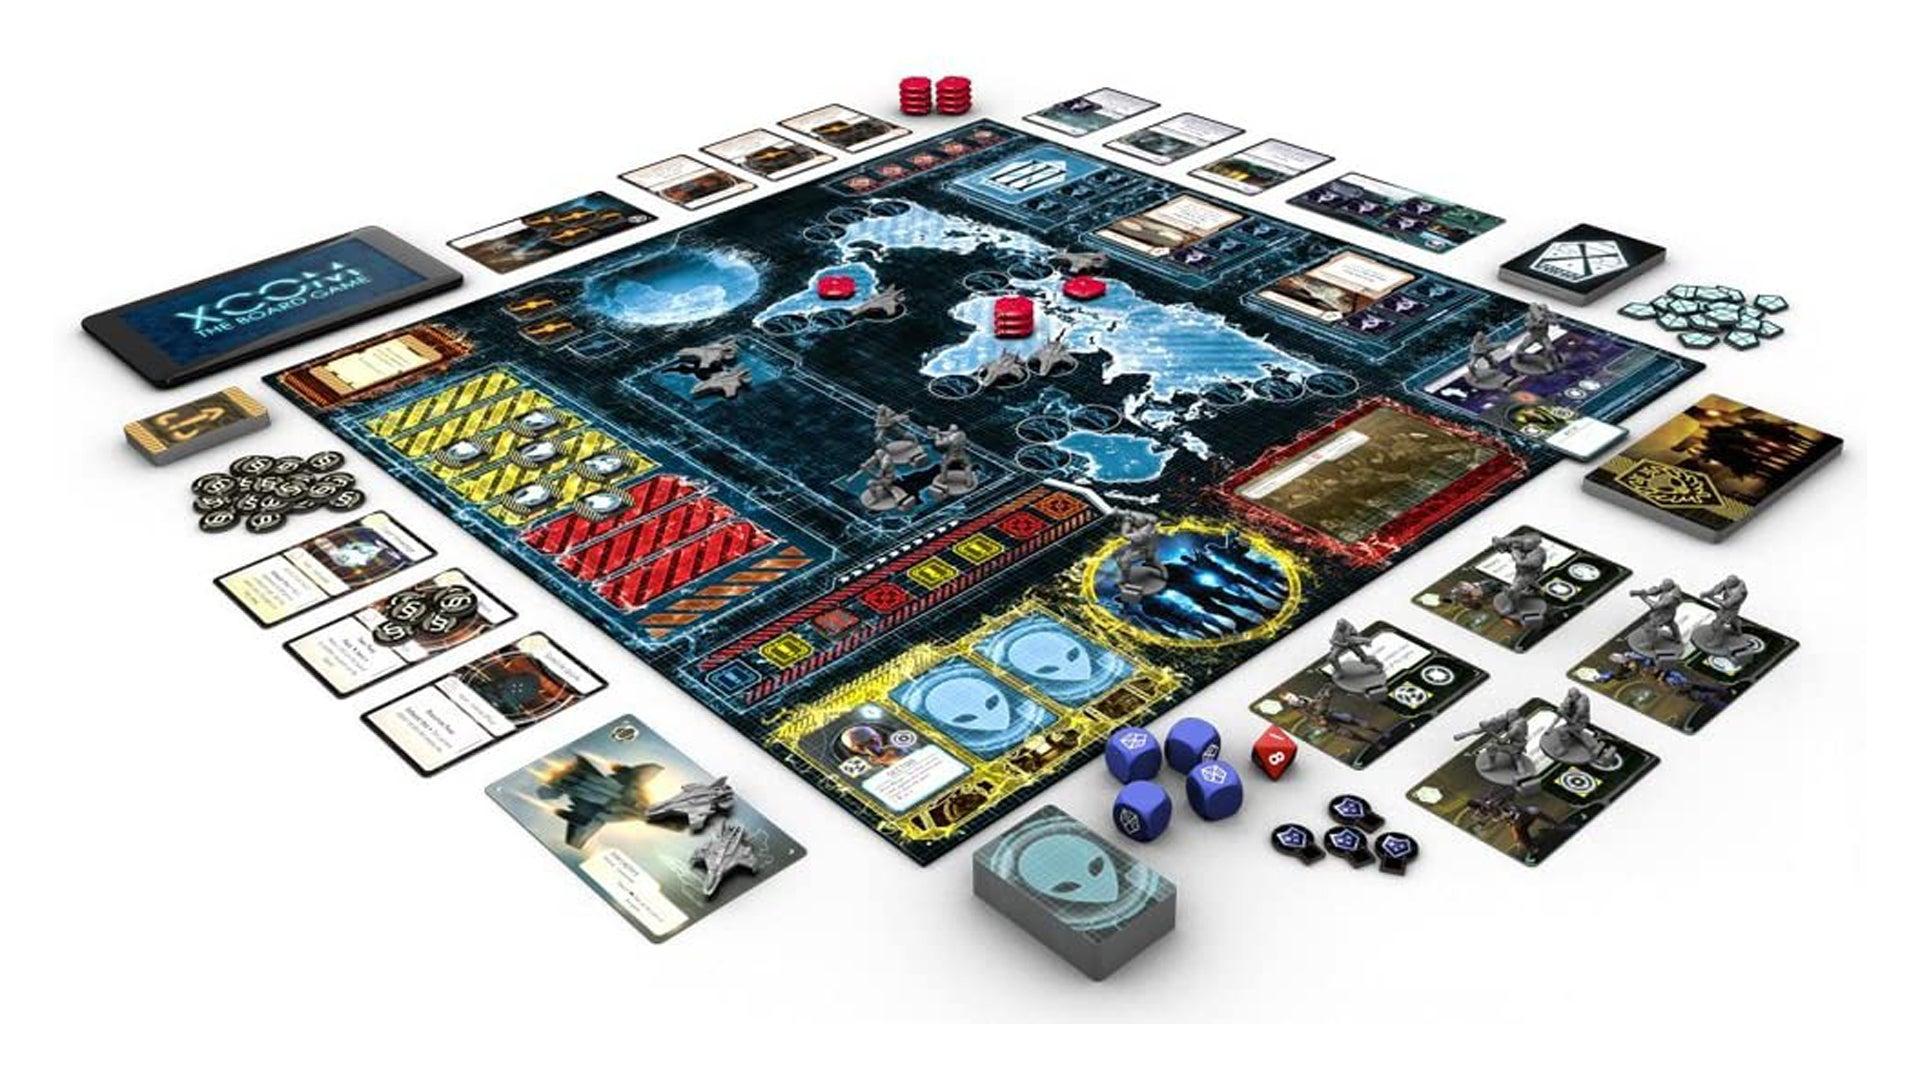 XCOM: The Board Game layout